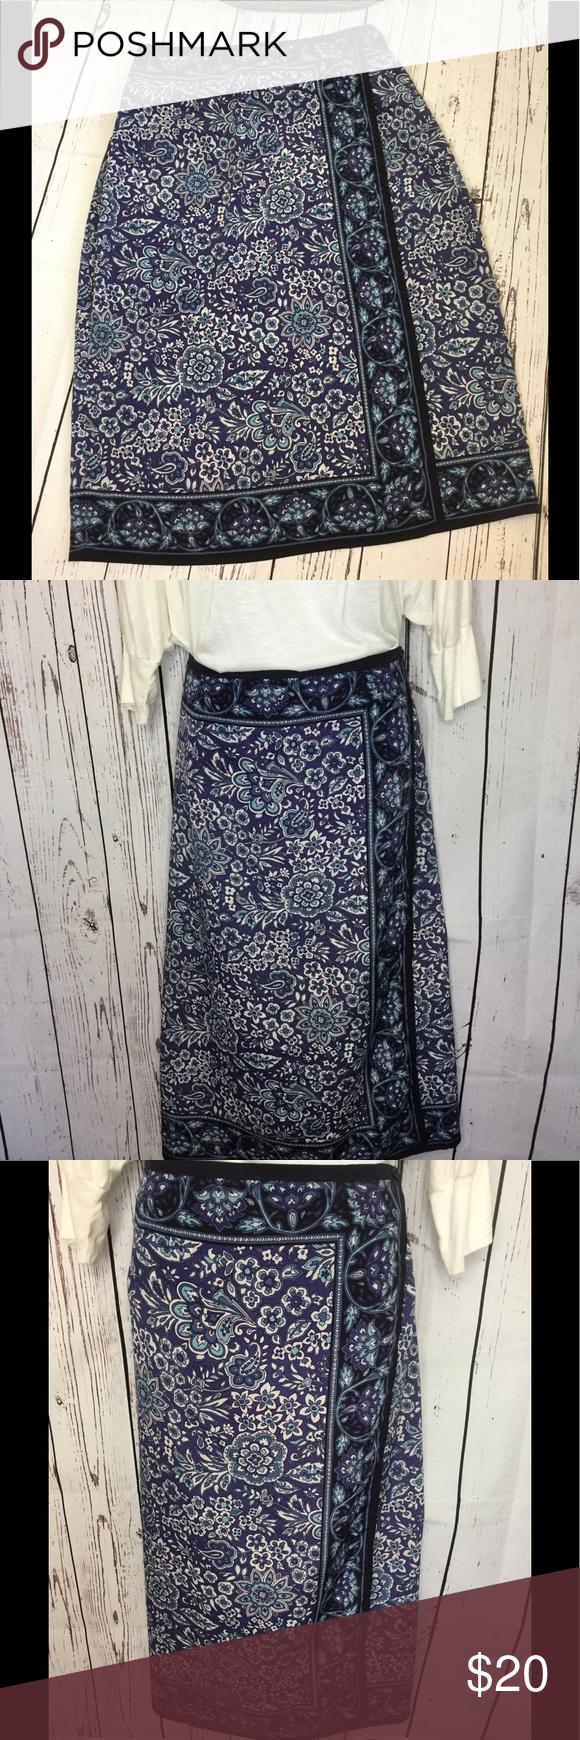 e0ea85a65bf EUC Sag Harbor Plus Size Faux Wrap Skirt EUC Sag Harbor size 16 faux wrap  skirt. Beautiful blue and white print with back elastic waist.